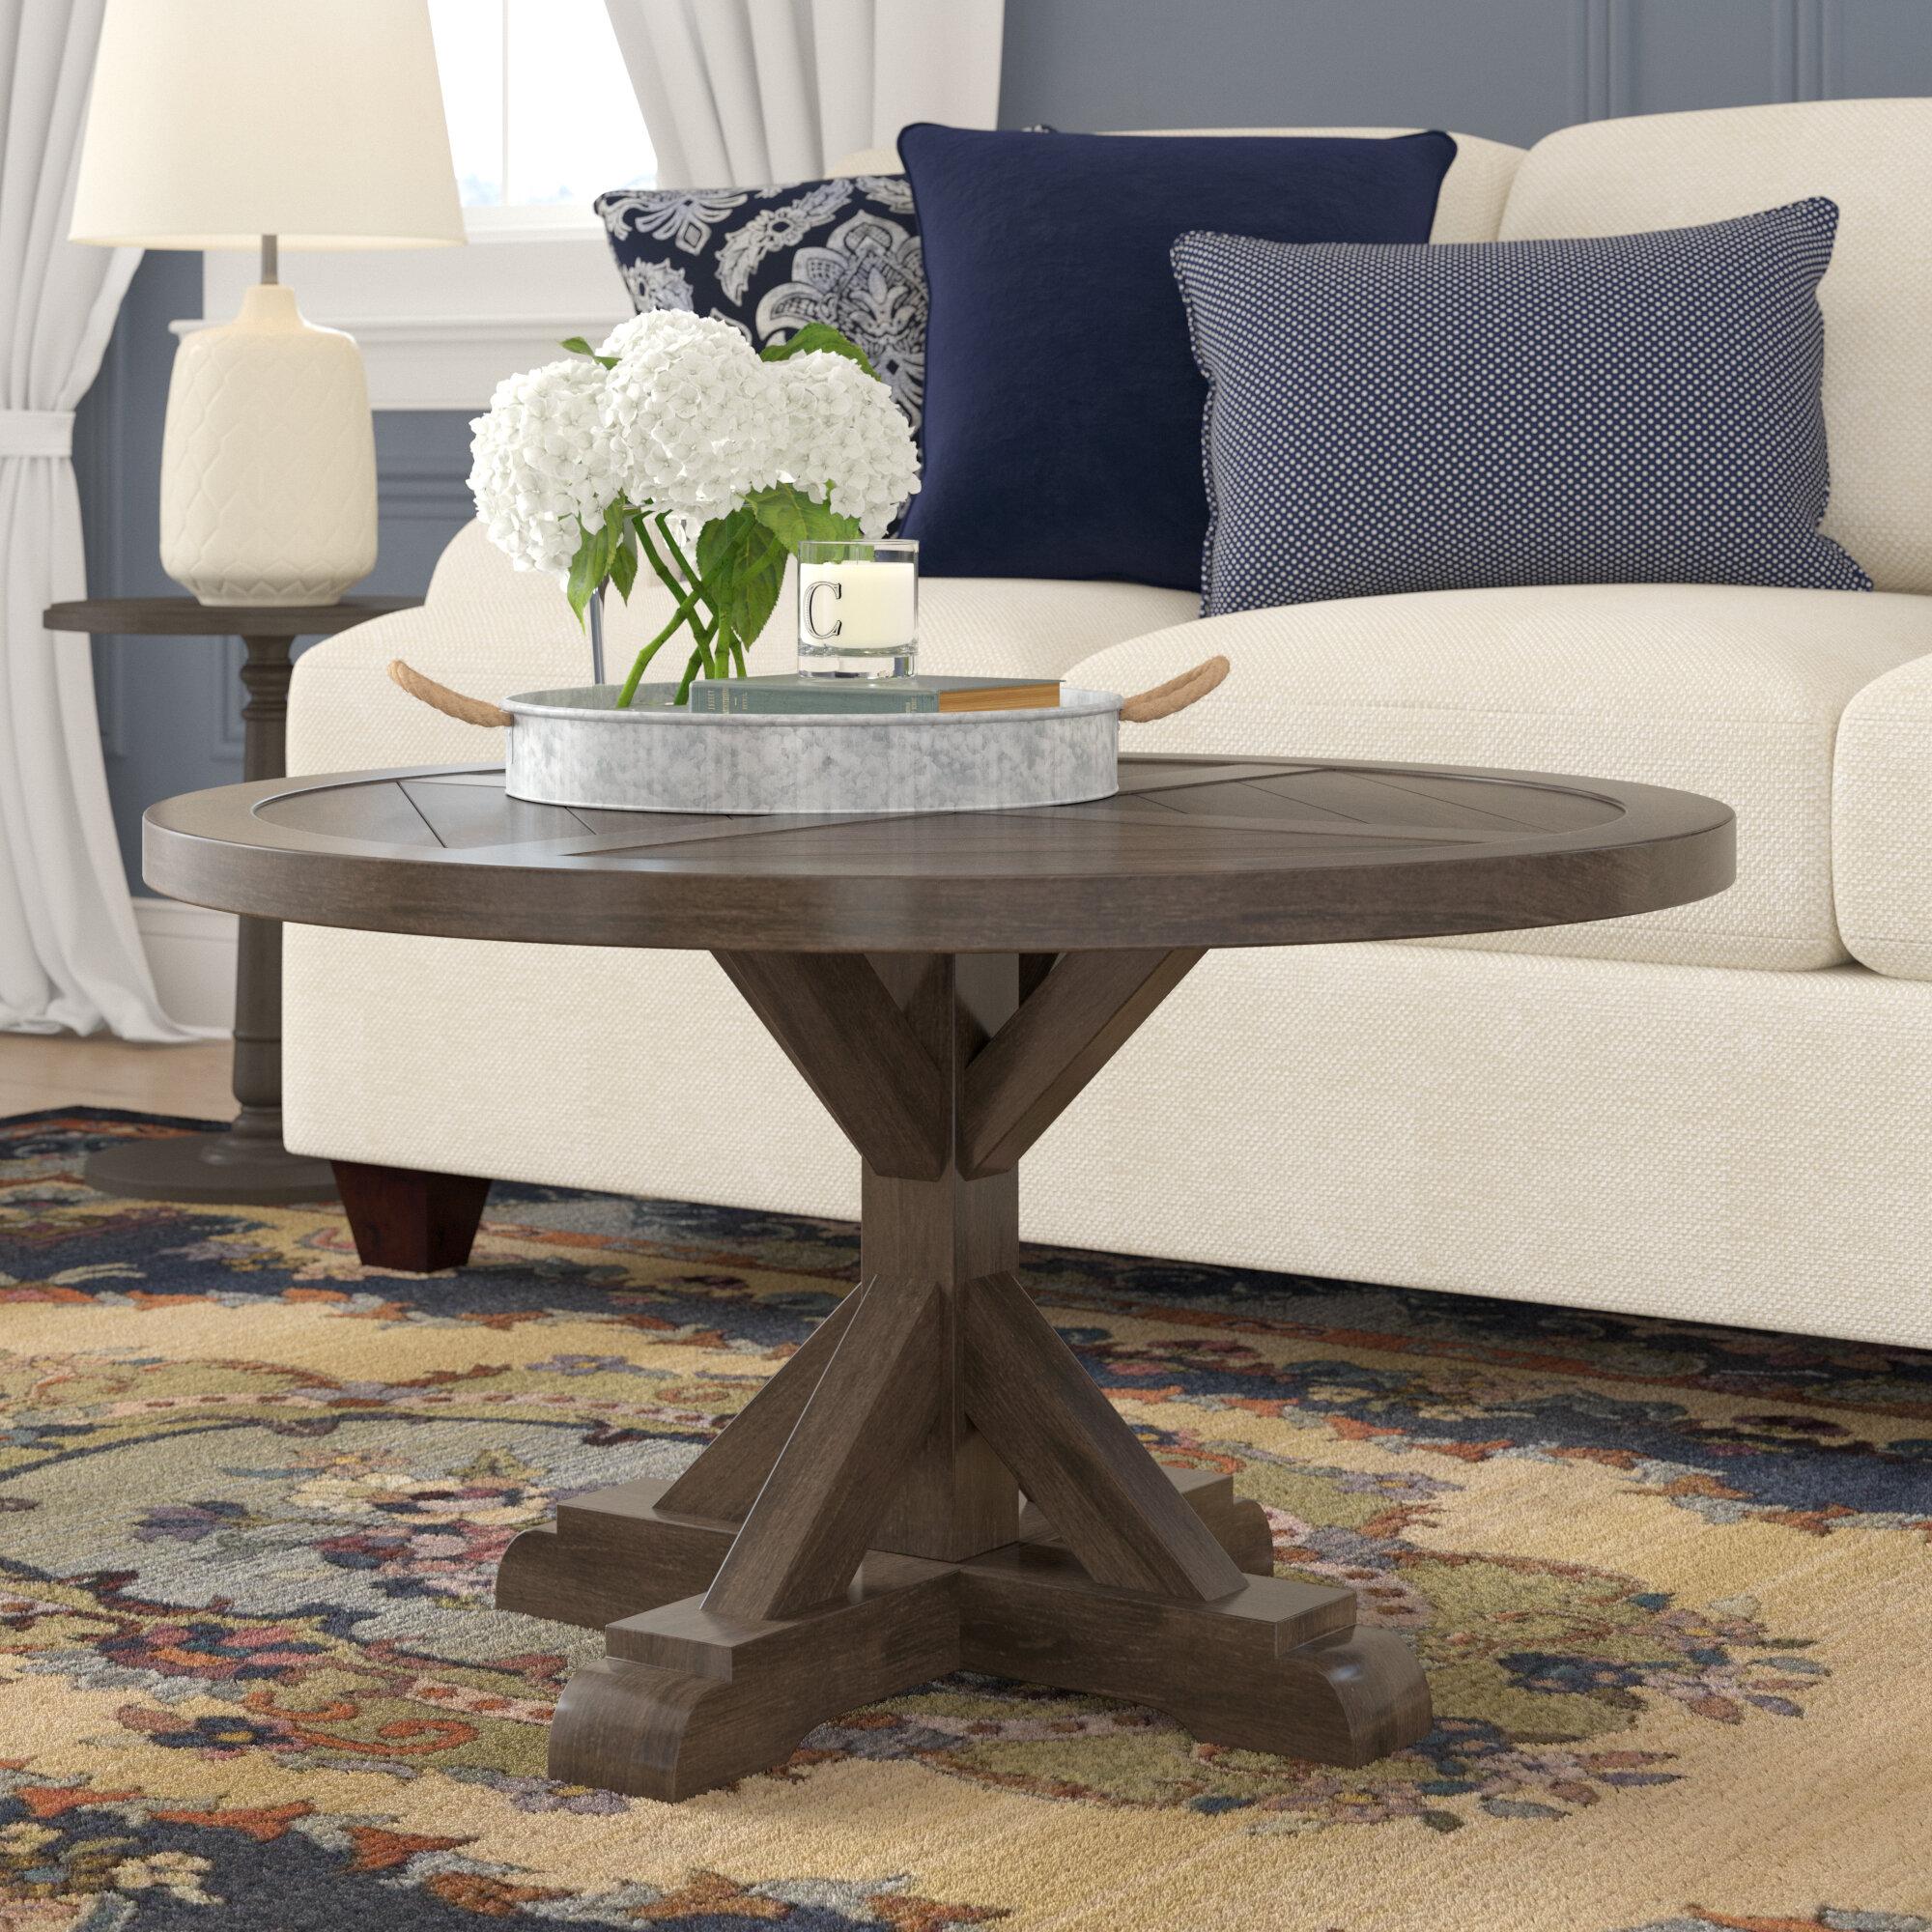 Rosalind Wheeler Isola Pedestal Coffee Table Reviews